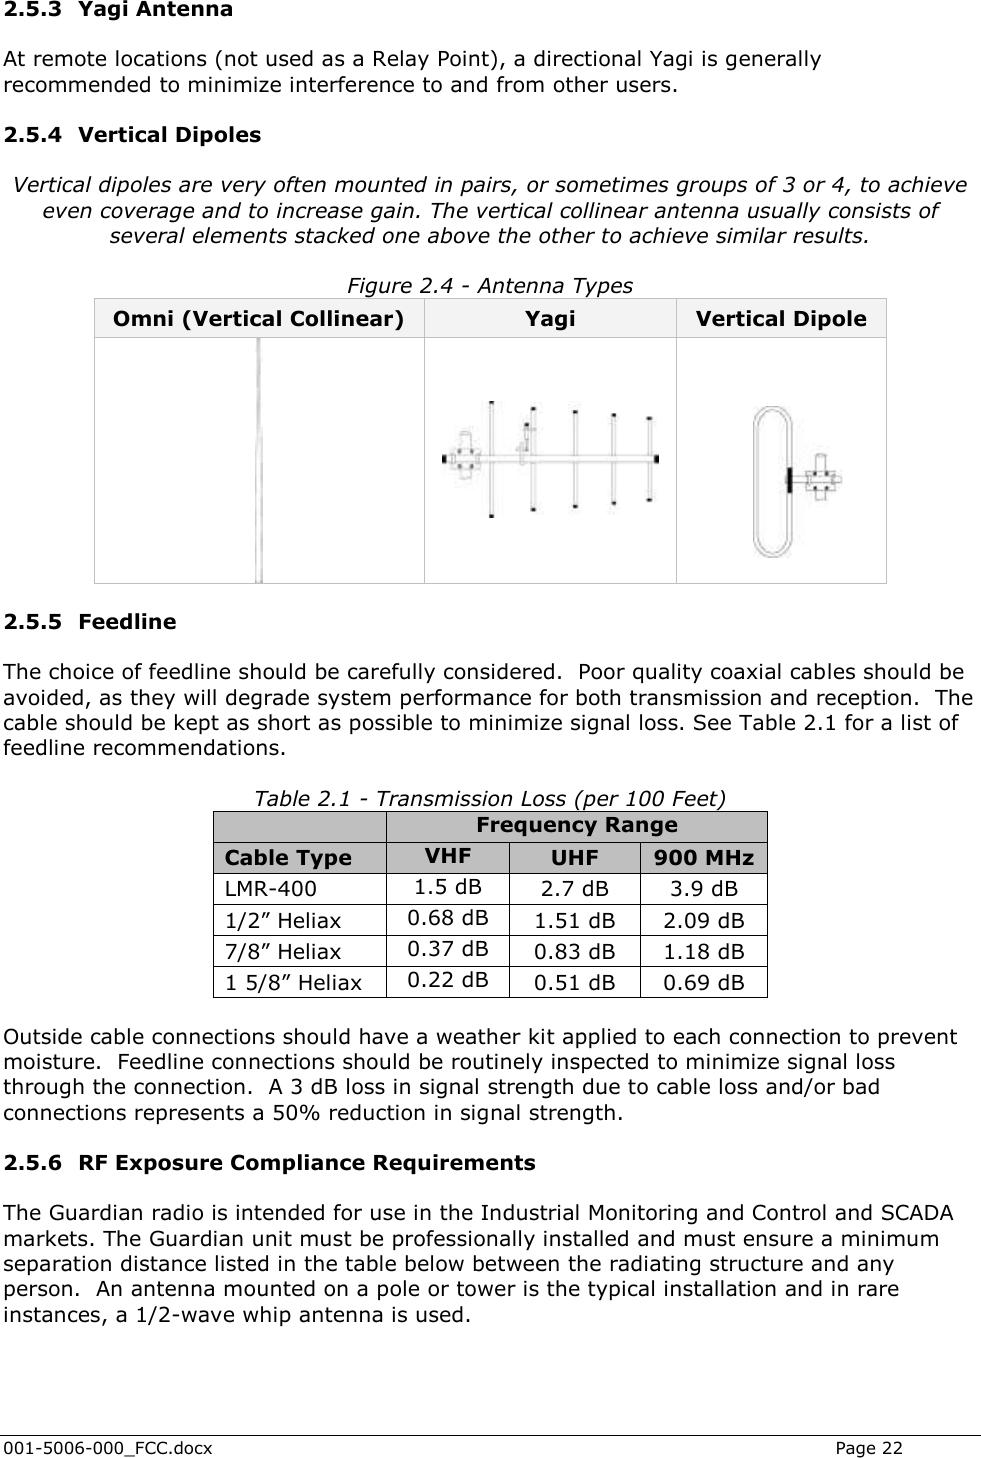 medium resolution of calamp gps wiring diagram calamp gps wiring diagram new 5046 300 guardian 400 wireless radio